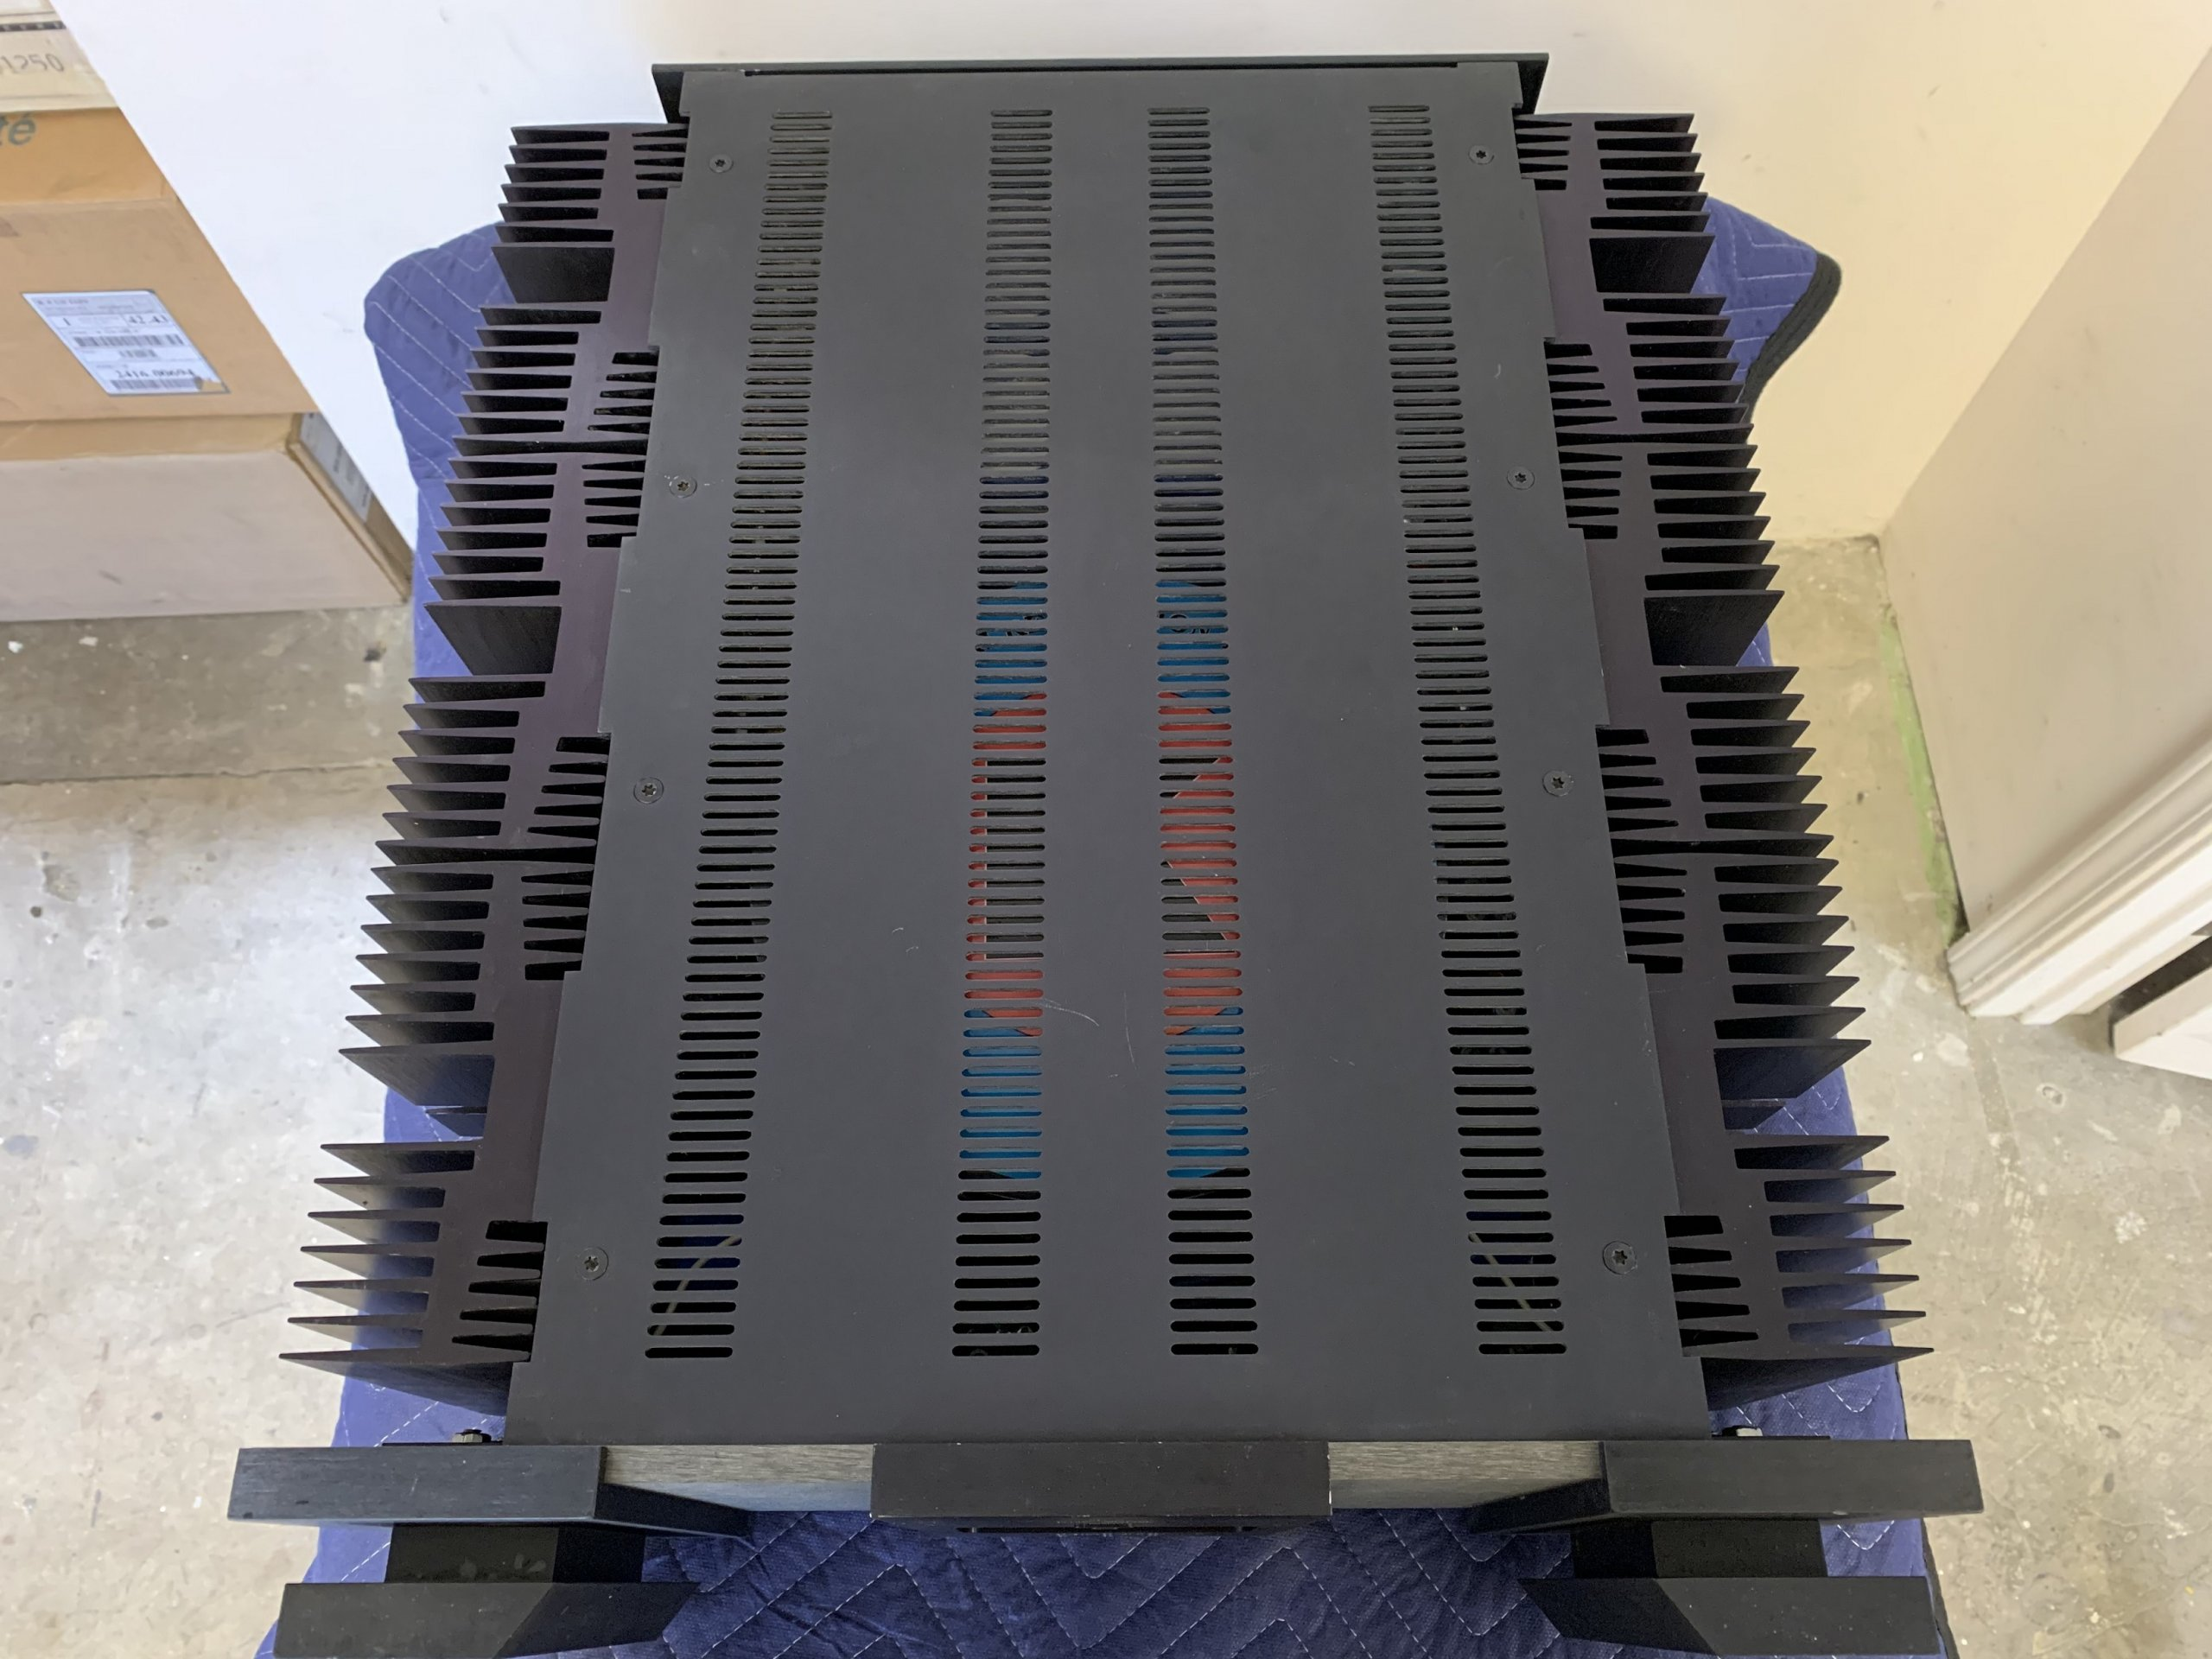 Krell KSA 300S amplifier